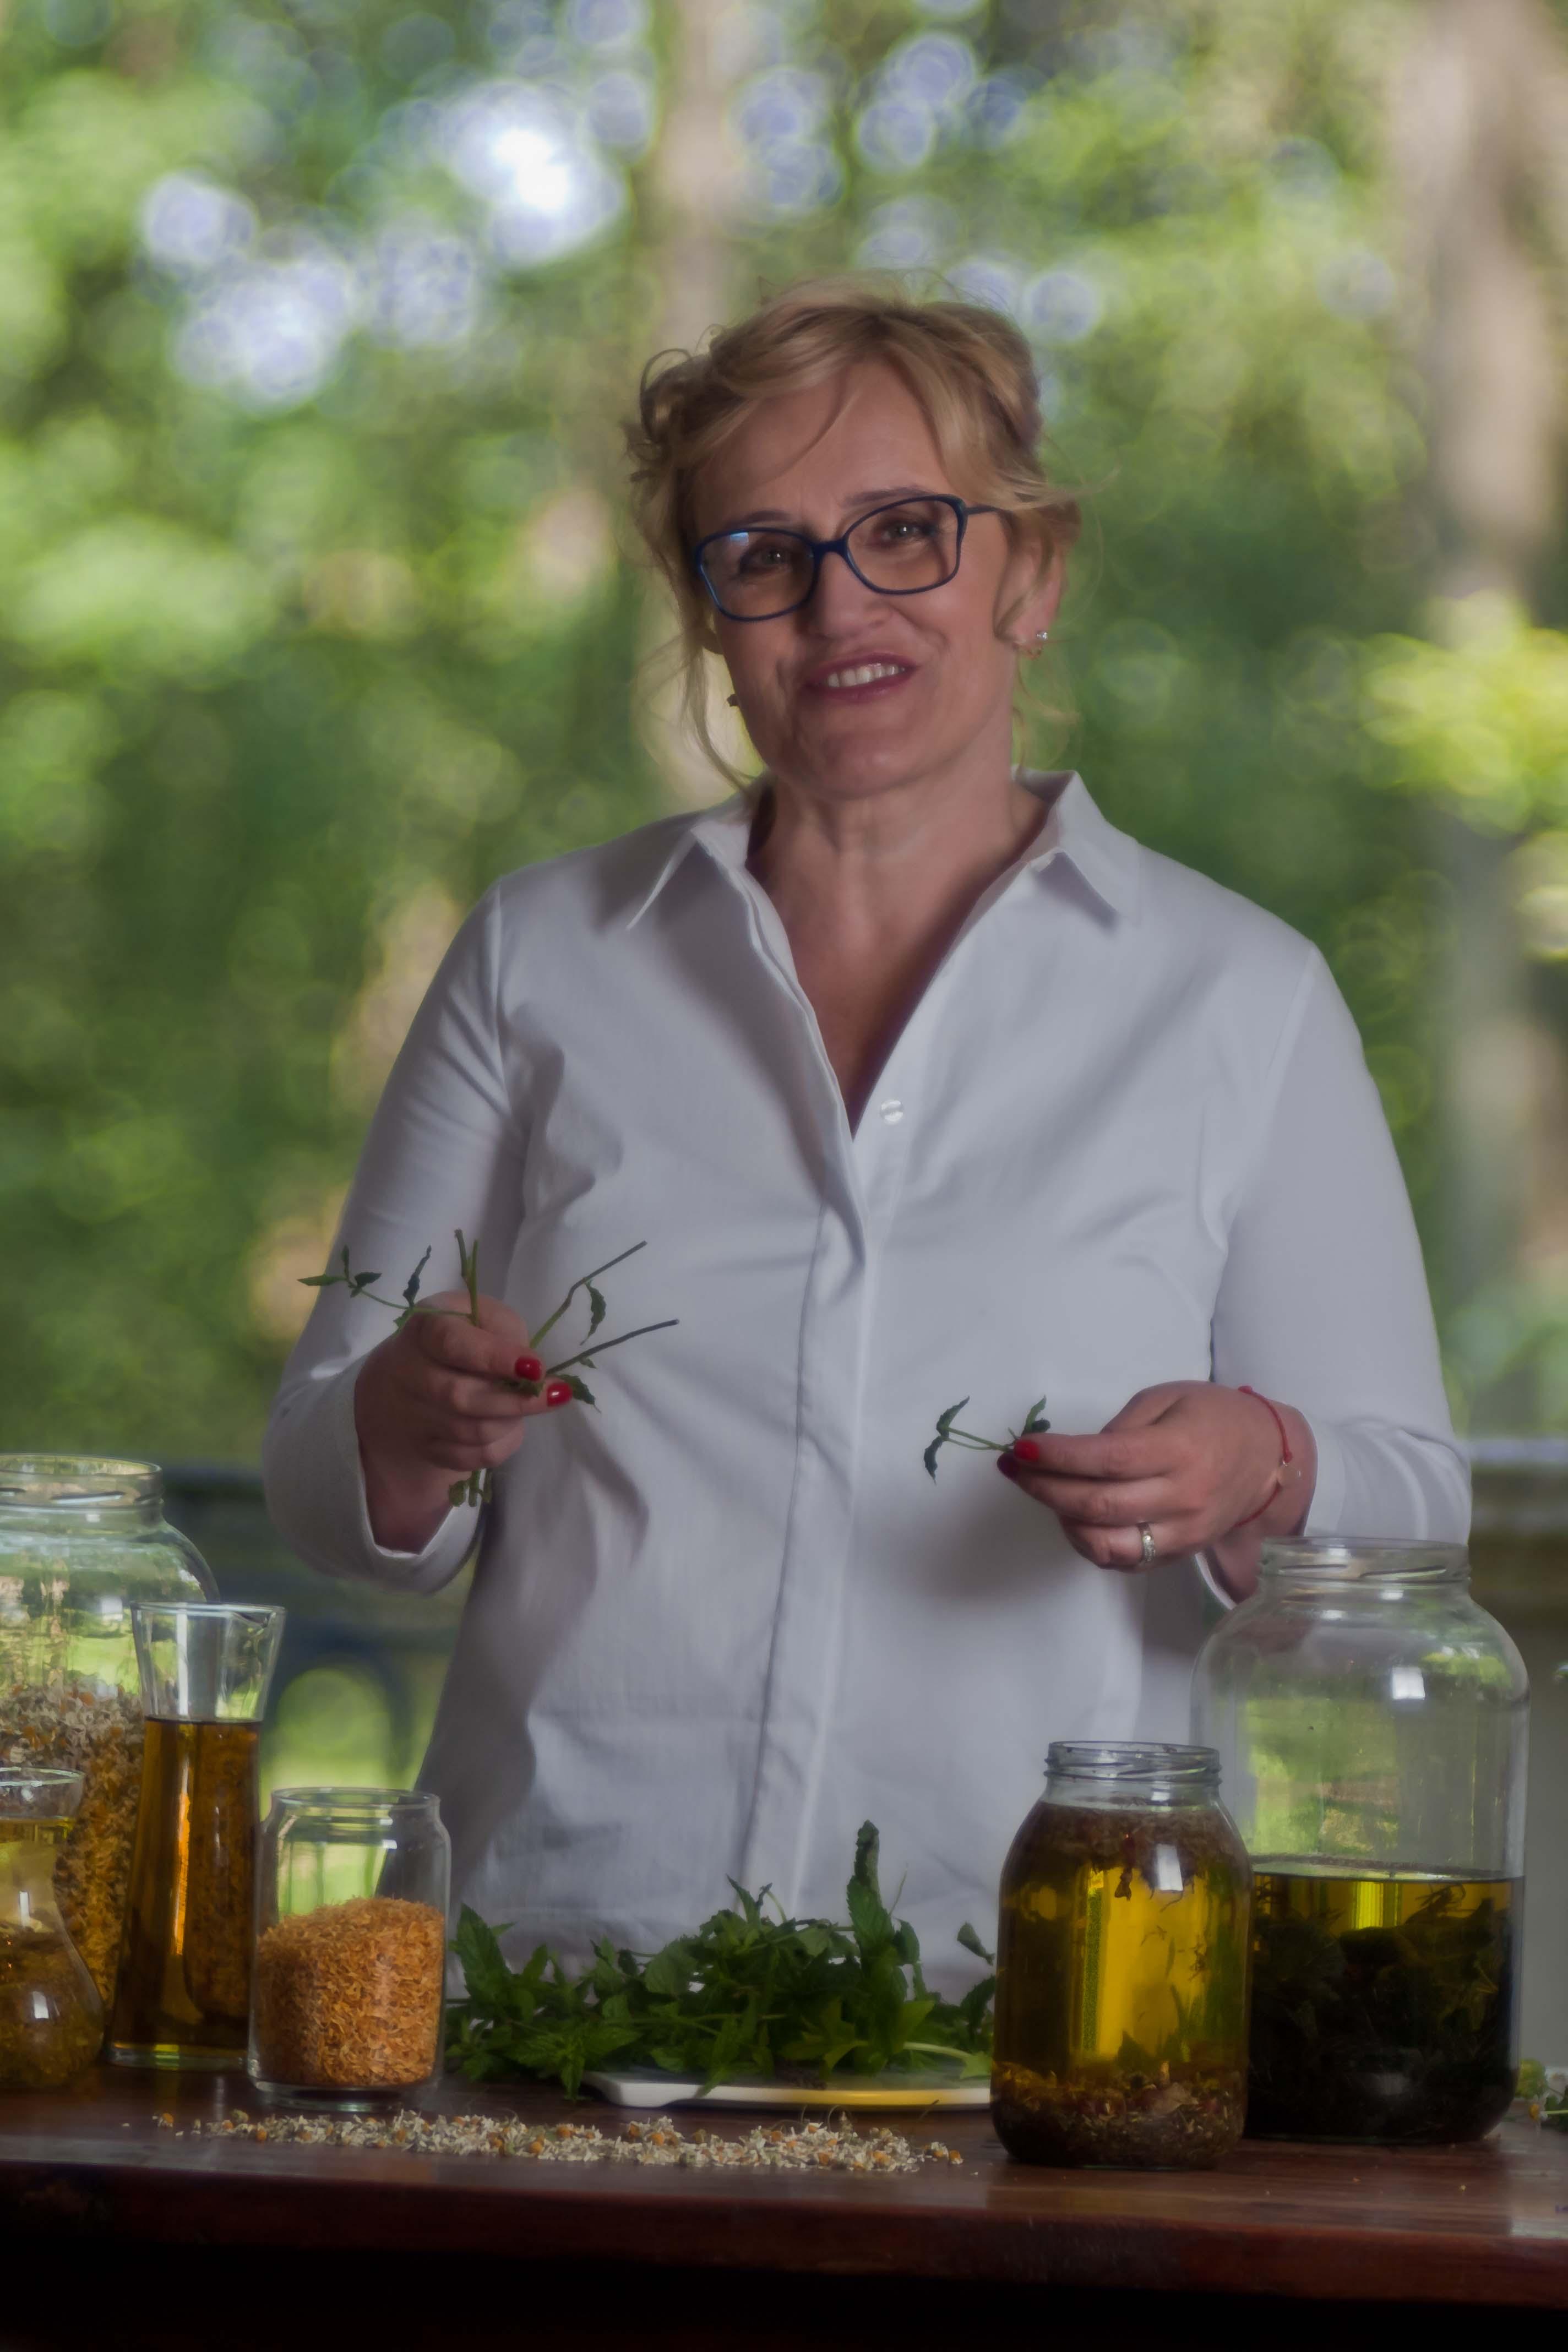 Twórczyni marki Umami - dr Dorota Rutkowska